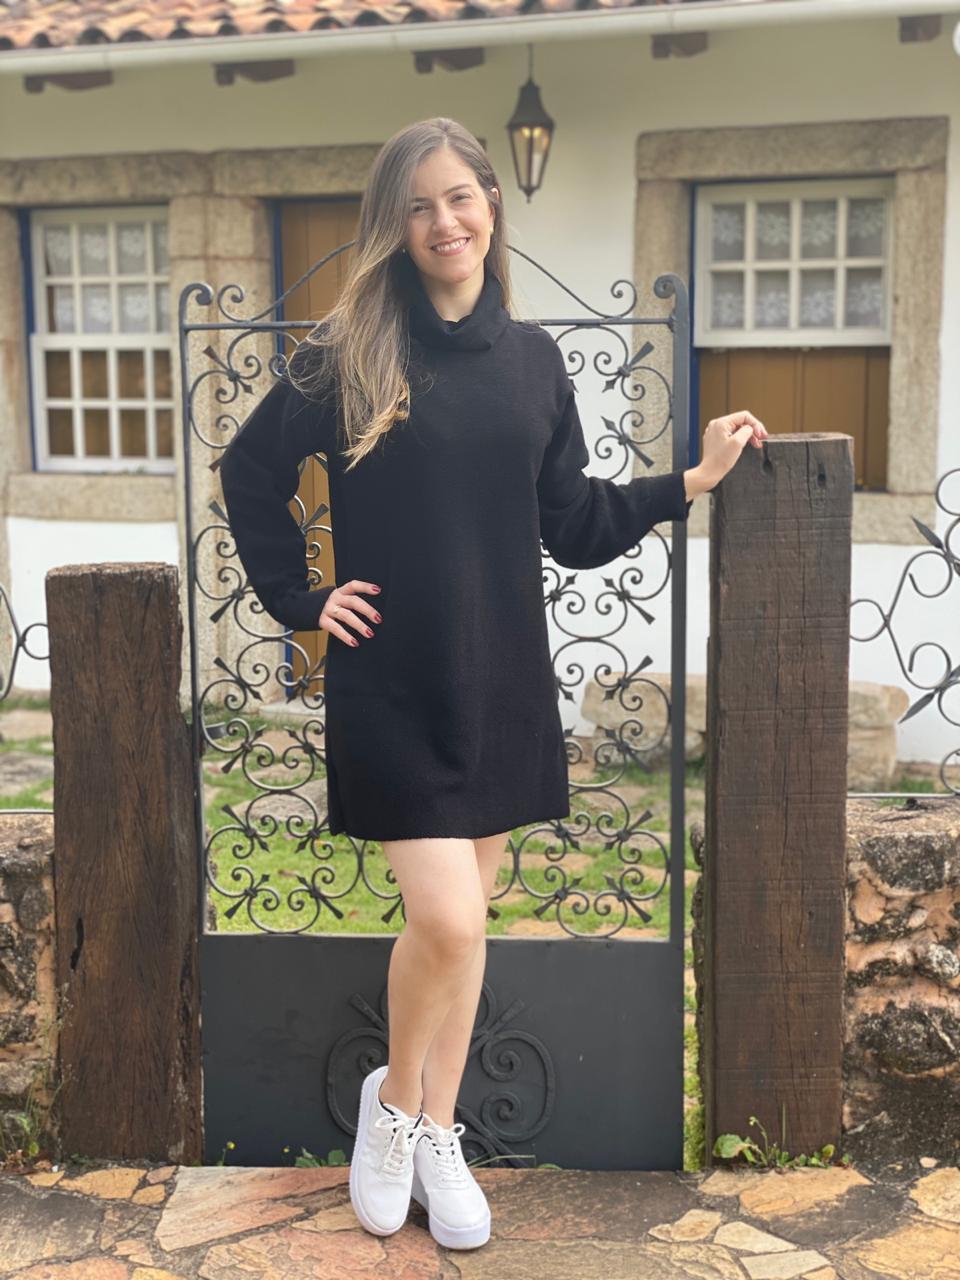 Vestido Curto Tricot Manga Longa Gola Alta Feminino Preto